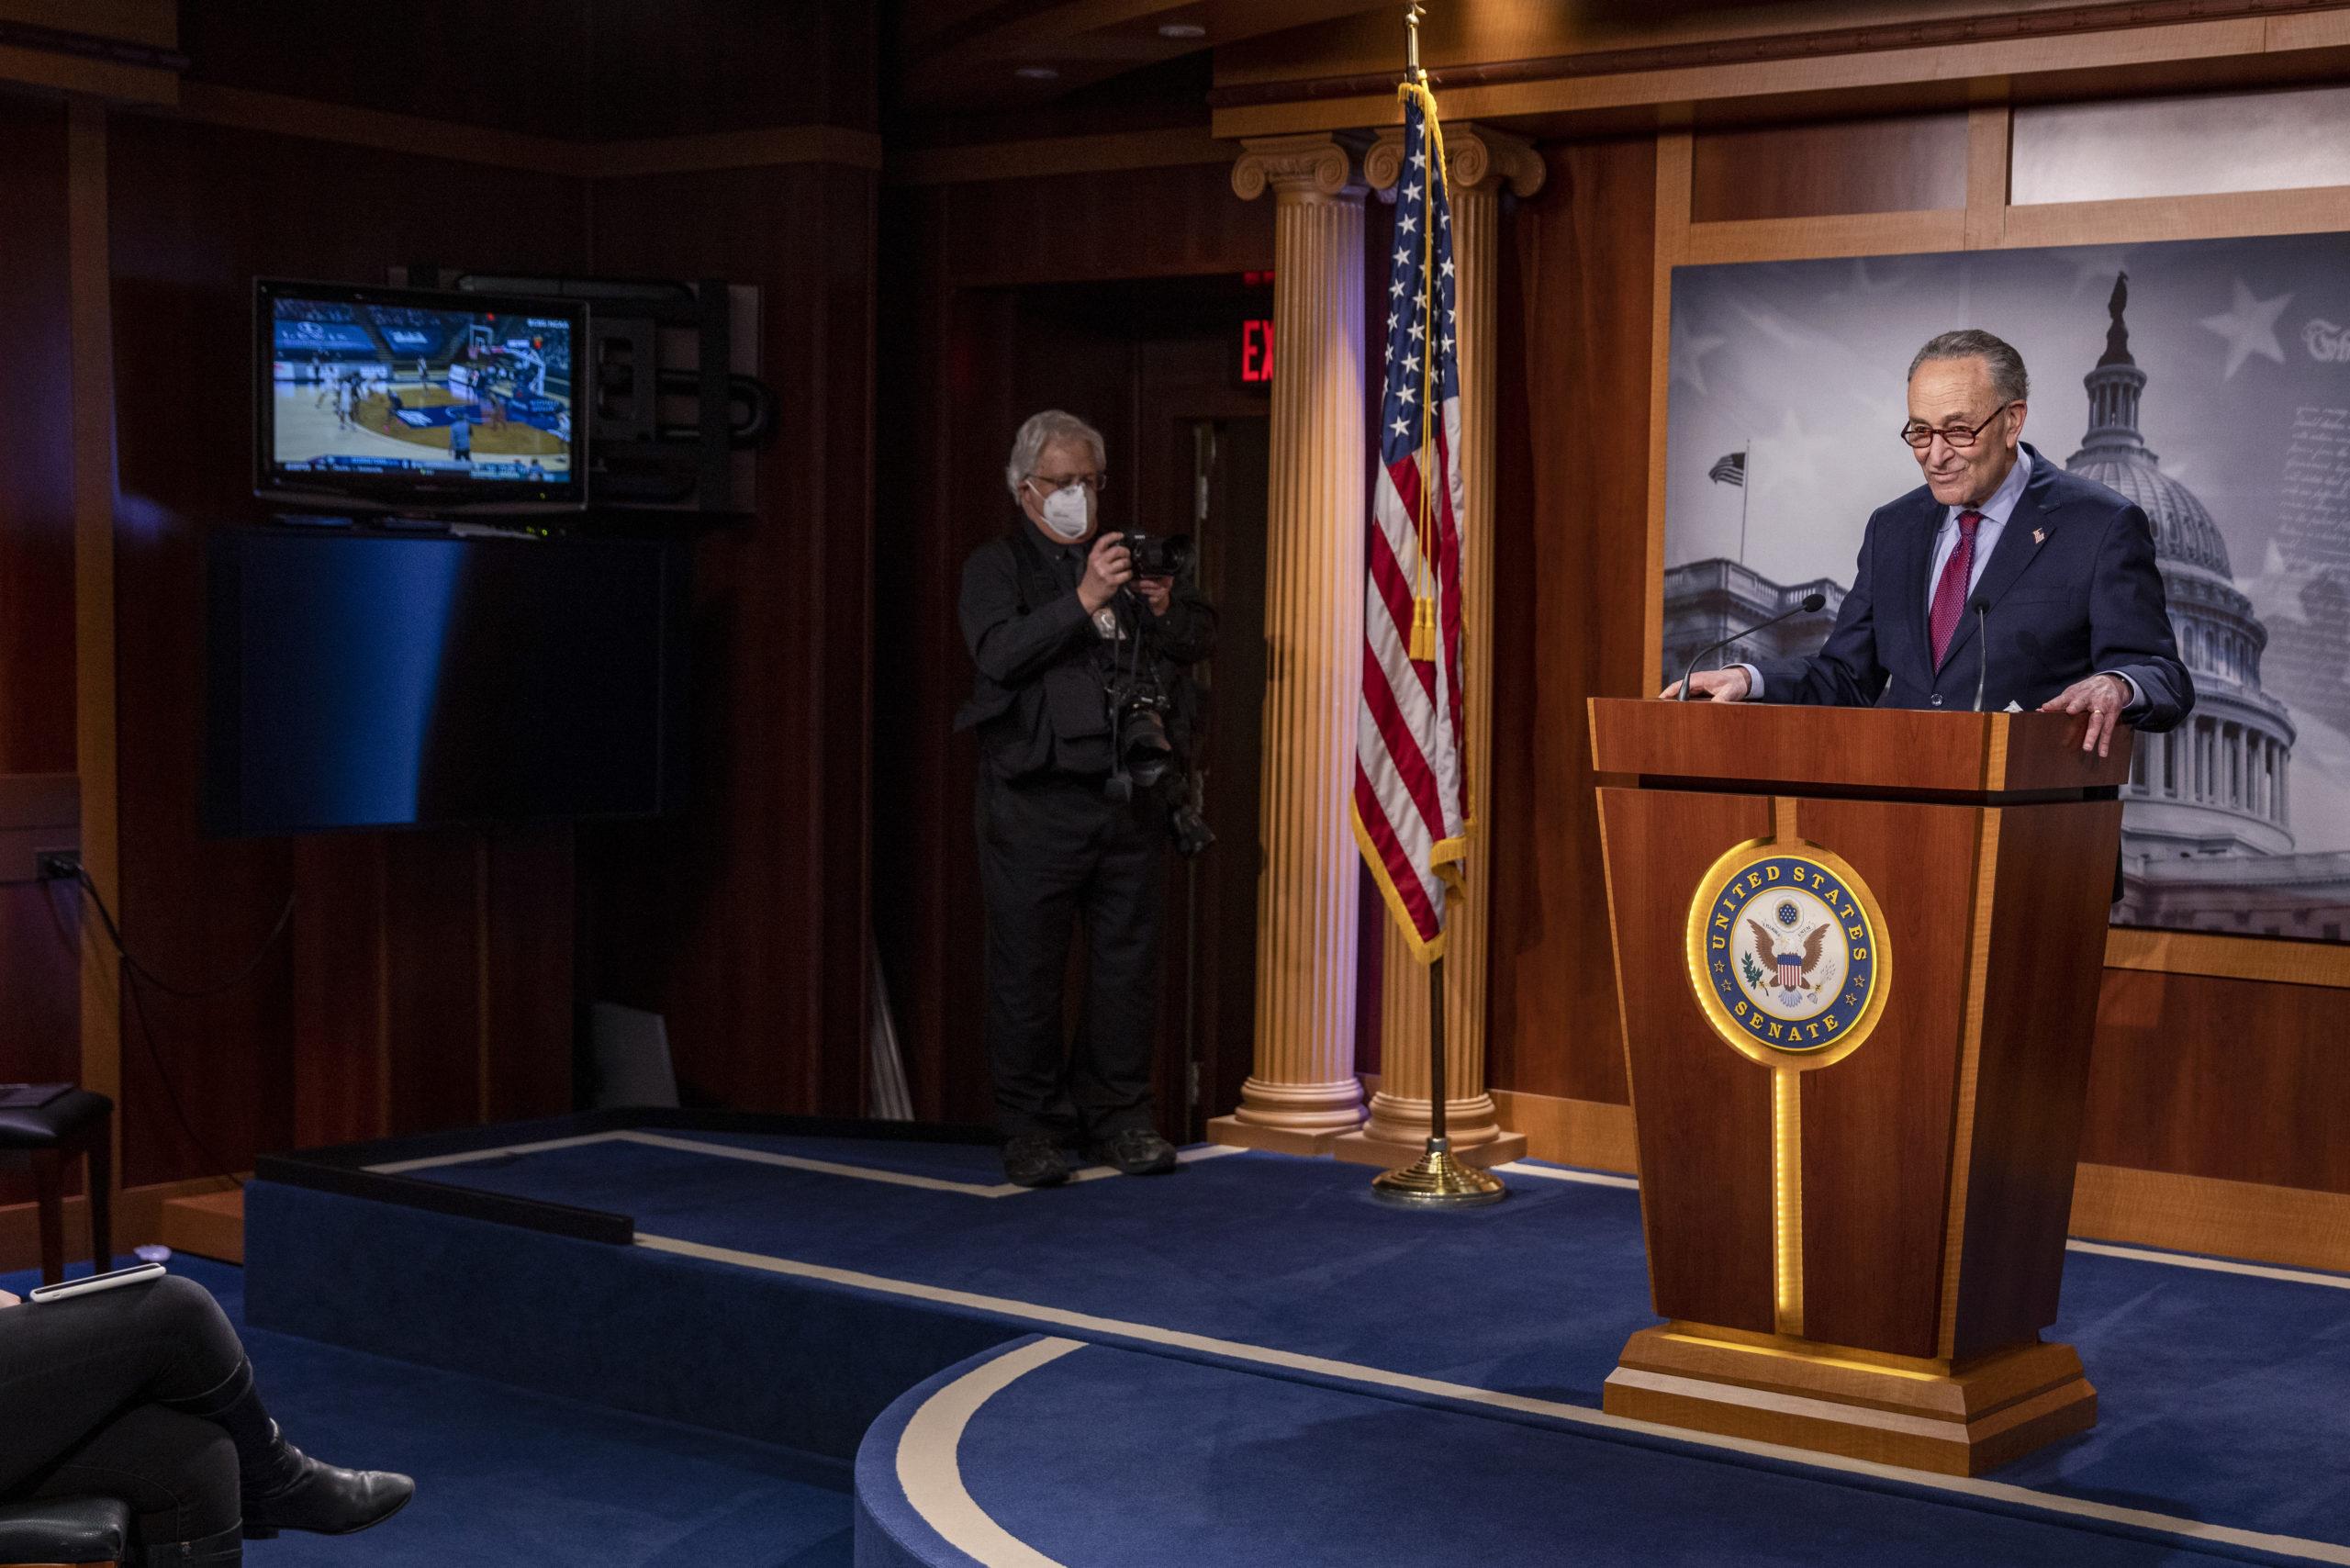 Senate Majority Leader Chuck Schumer speaks to reporters Saturday after the Senate passed the $1.9 trillion coronavirus stimulus package. (Tasos Katopodis/Getty Images)